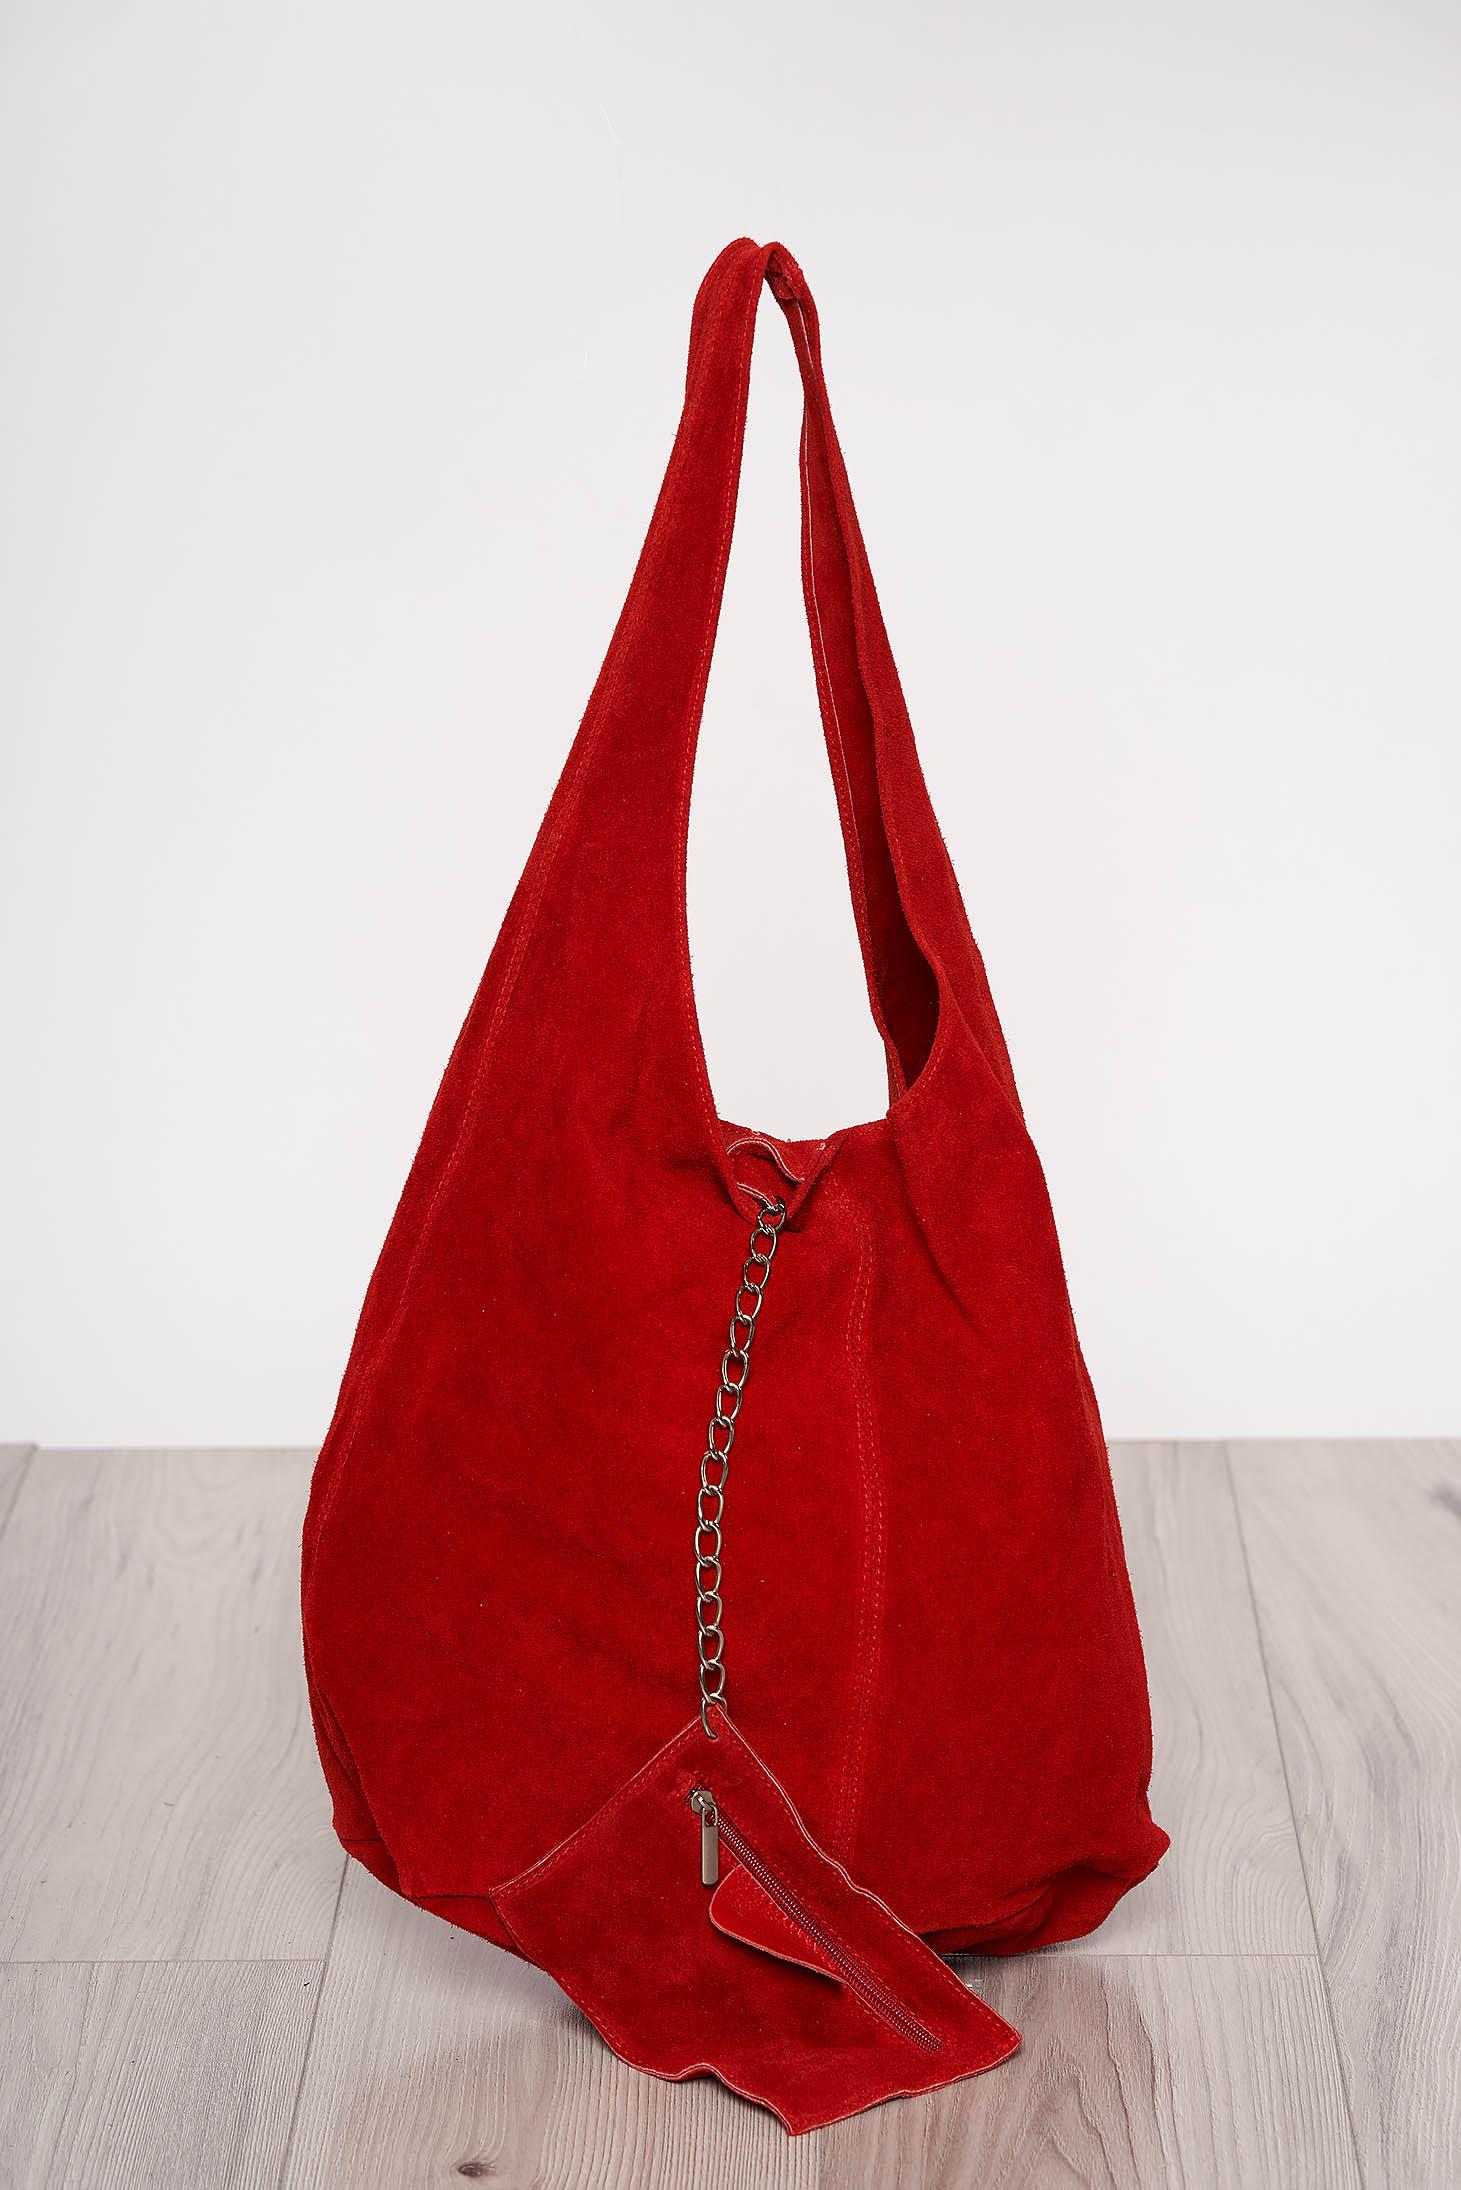 Geanta dama rosie casual din piele naturala cu manere de lungime medie cu accesoriu inclus